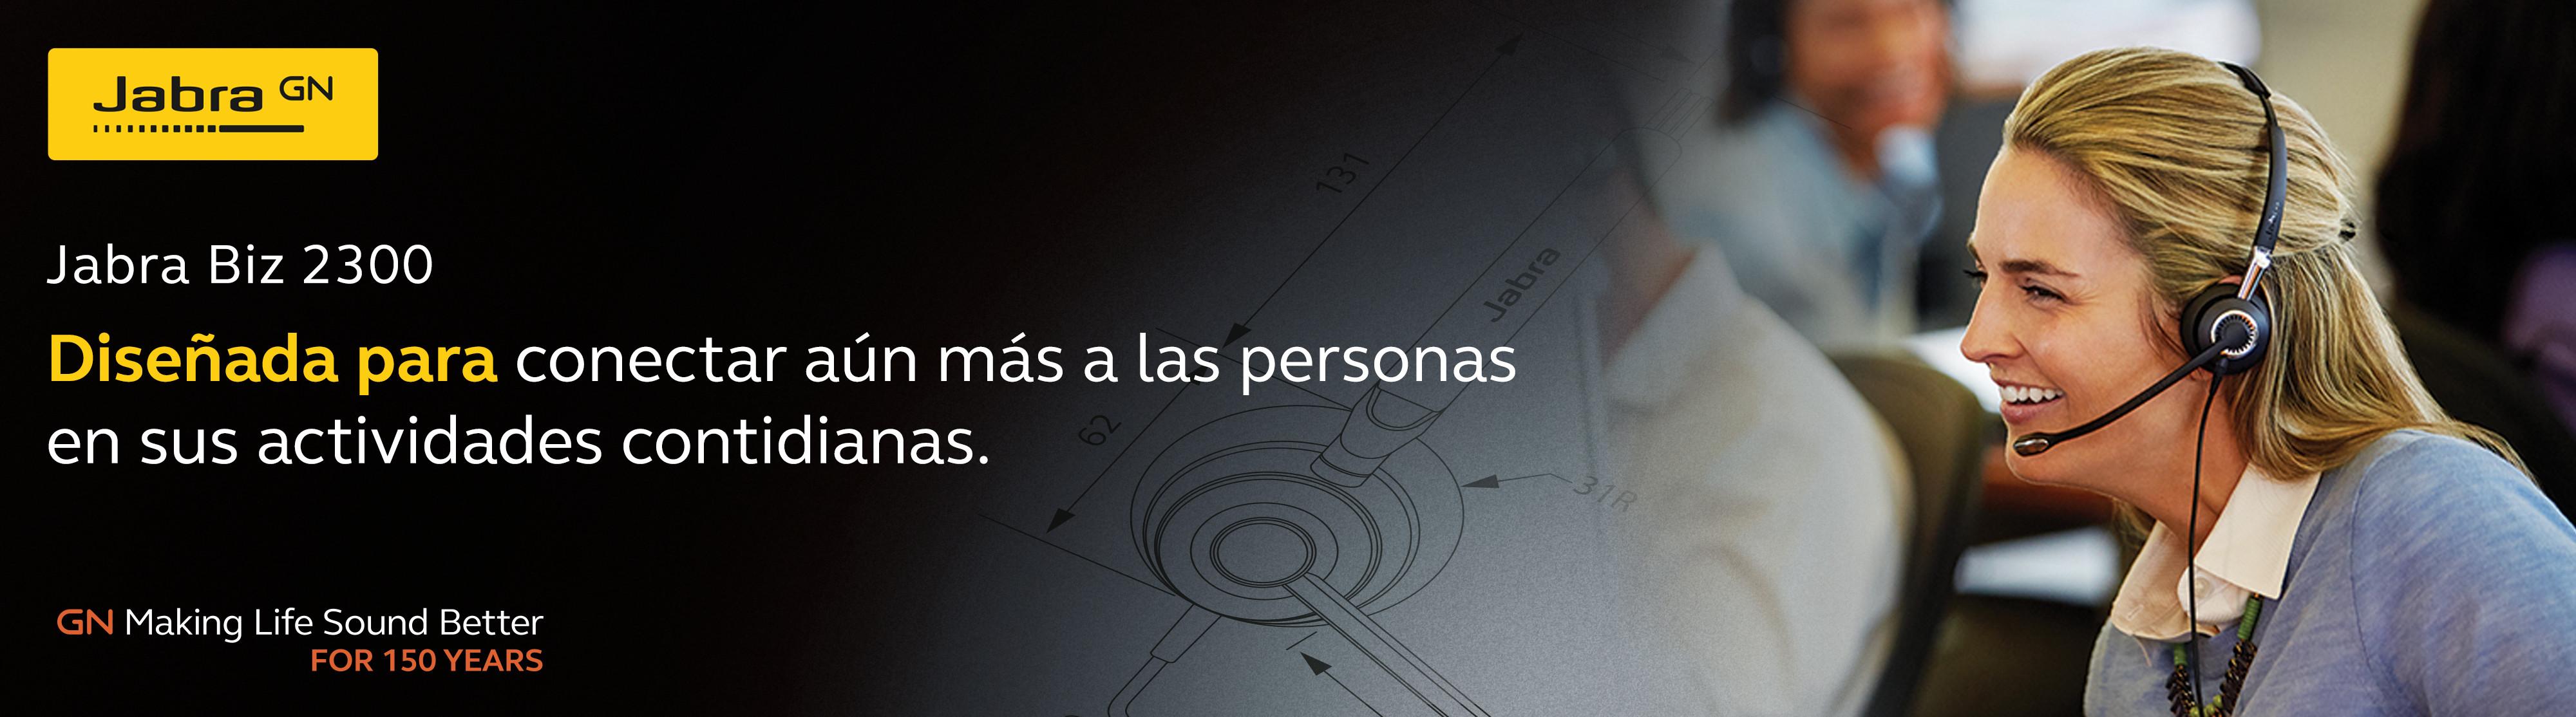 Jabra Distribuidores - Bogotá D.C - Audífonos bluetooth - Audífonos para PC - Auriculares Call Center